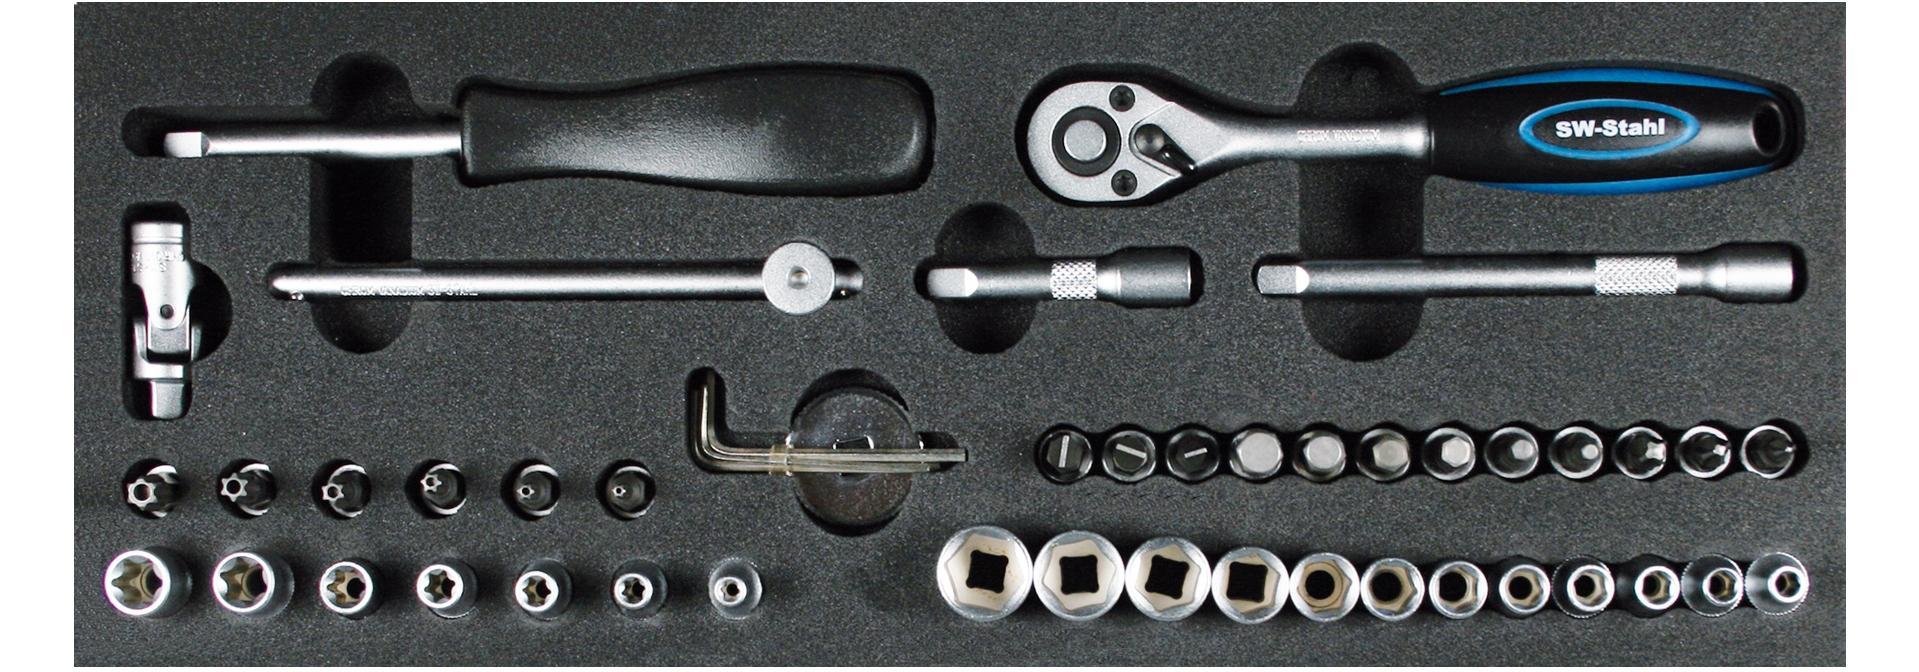 SW-Stahl  Z2525-2 Kit de herramientas